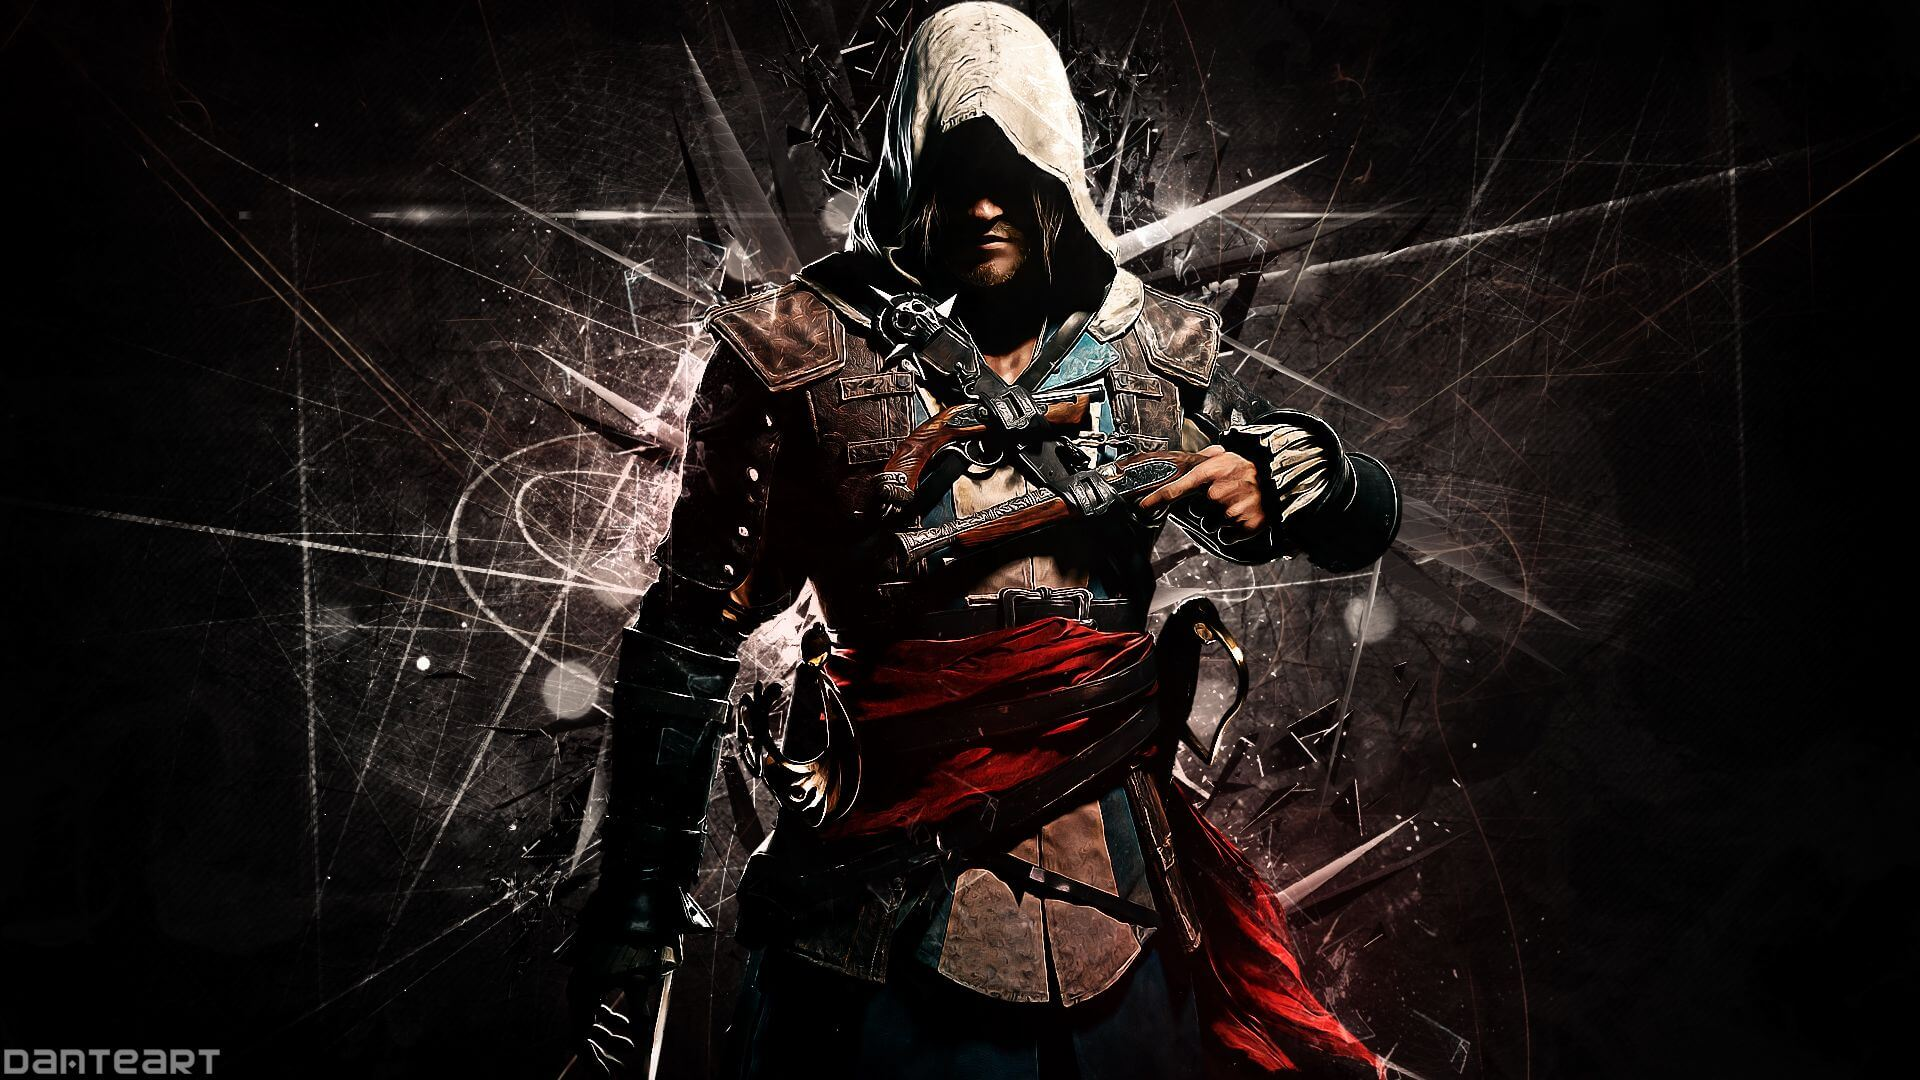 Обои и картинки Assassins creed на рабочий стол - подборка 15